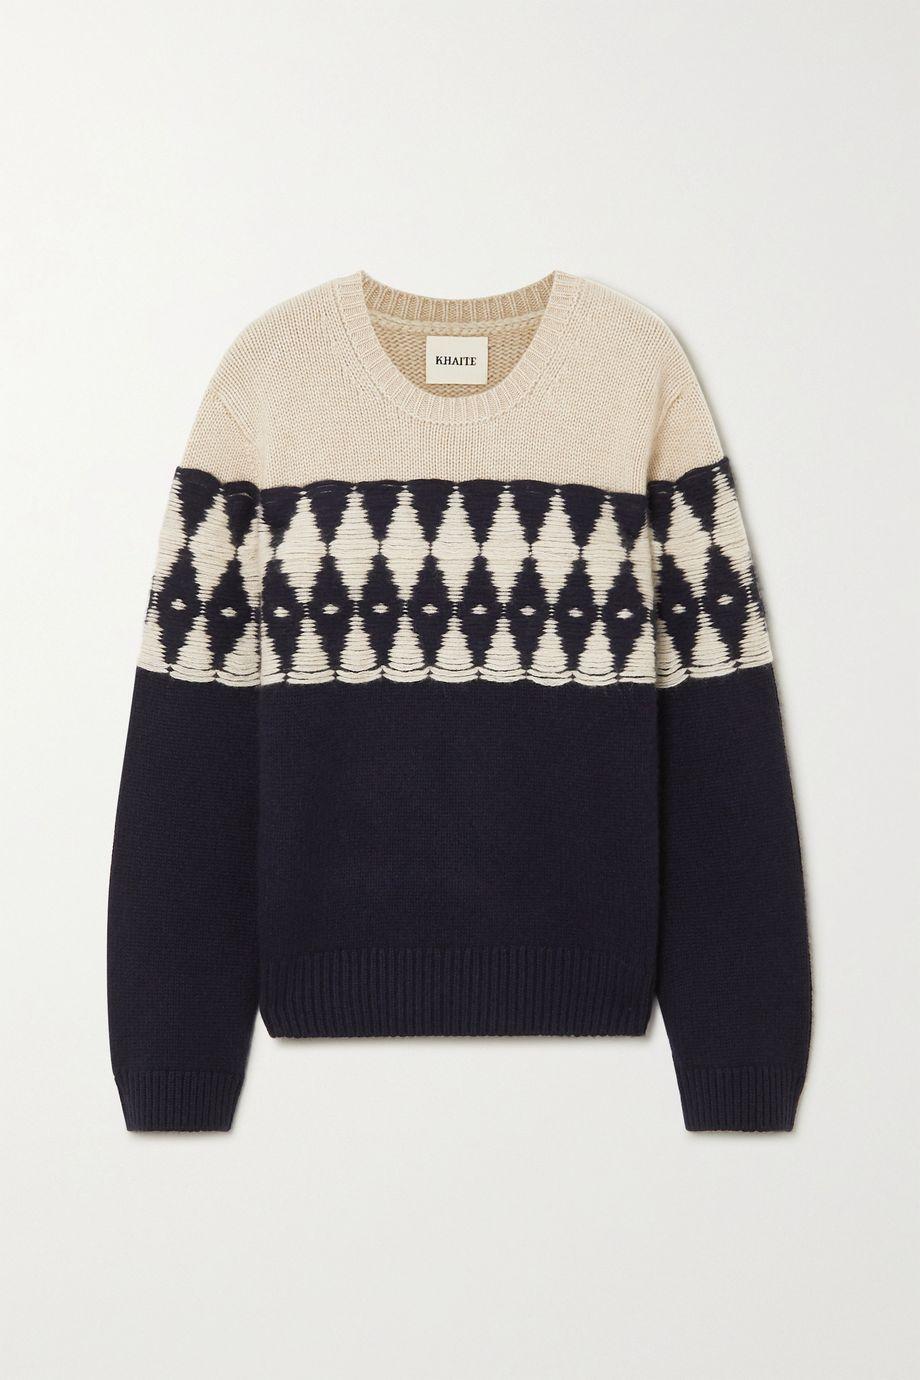 Khaite Romme 菱形花纹羊绒毛衣